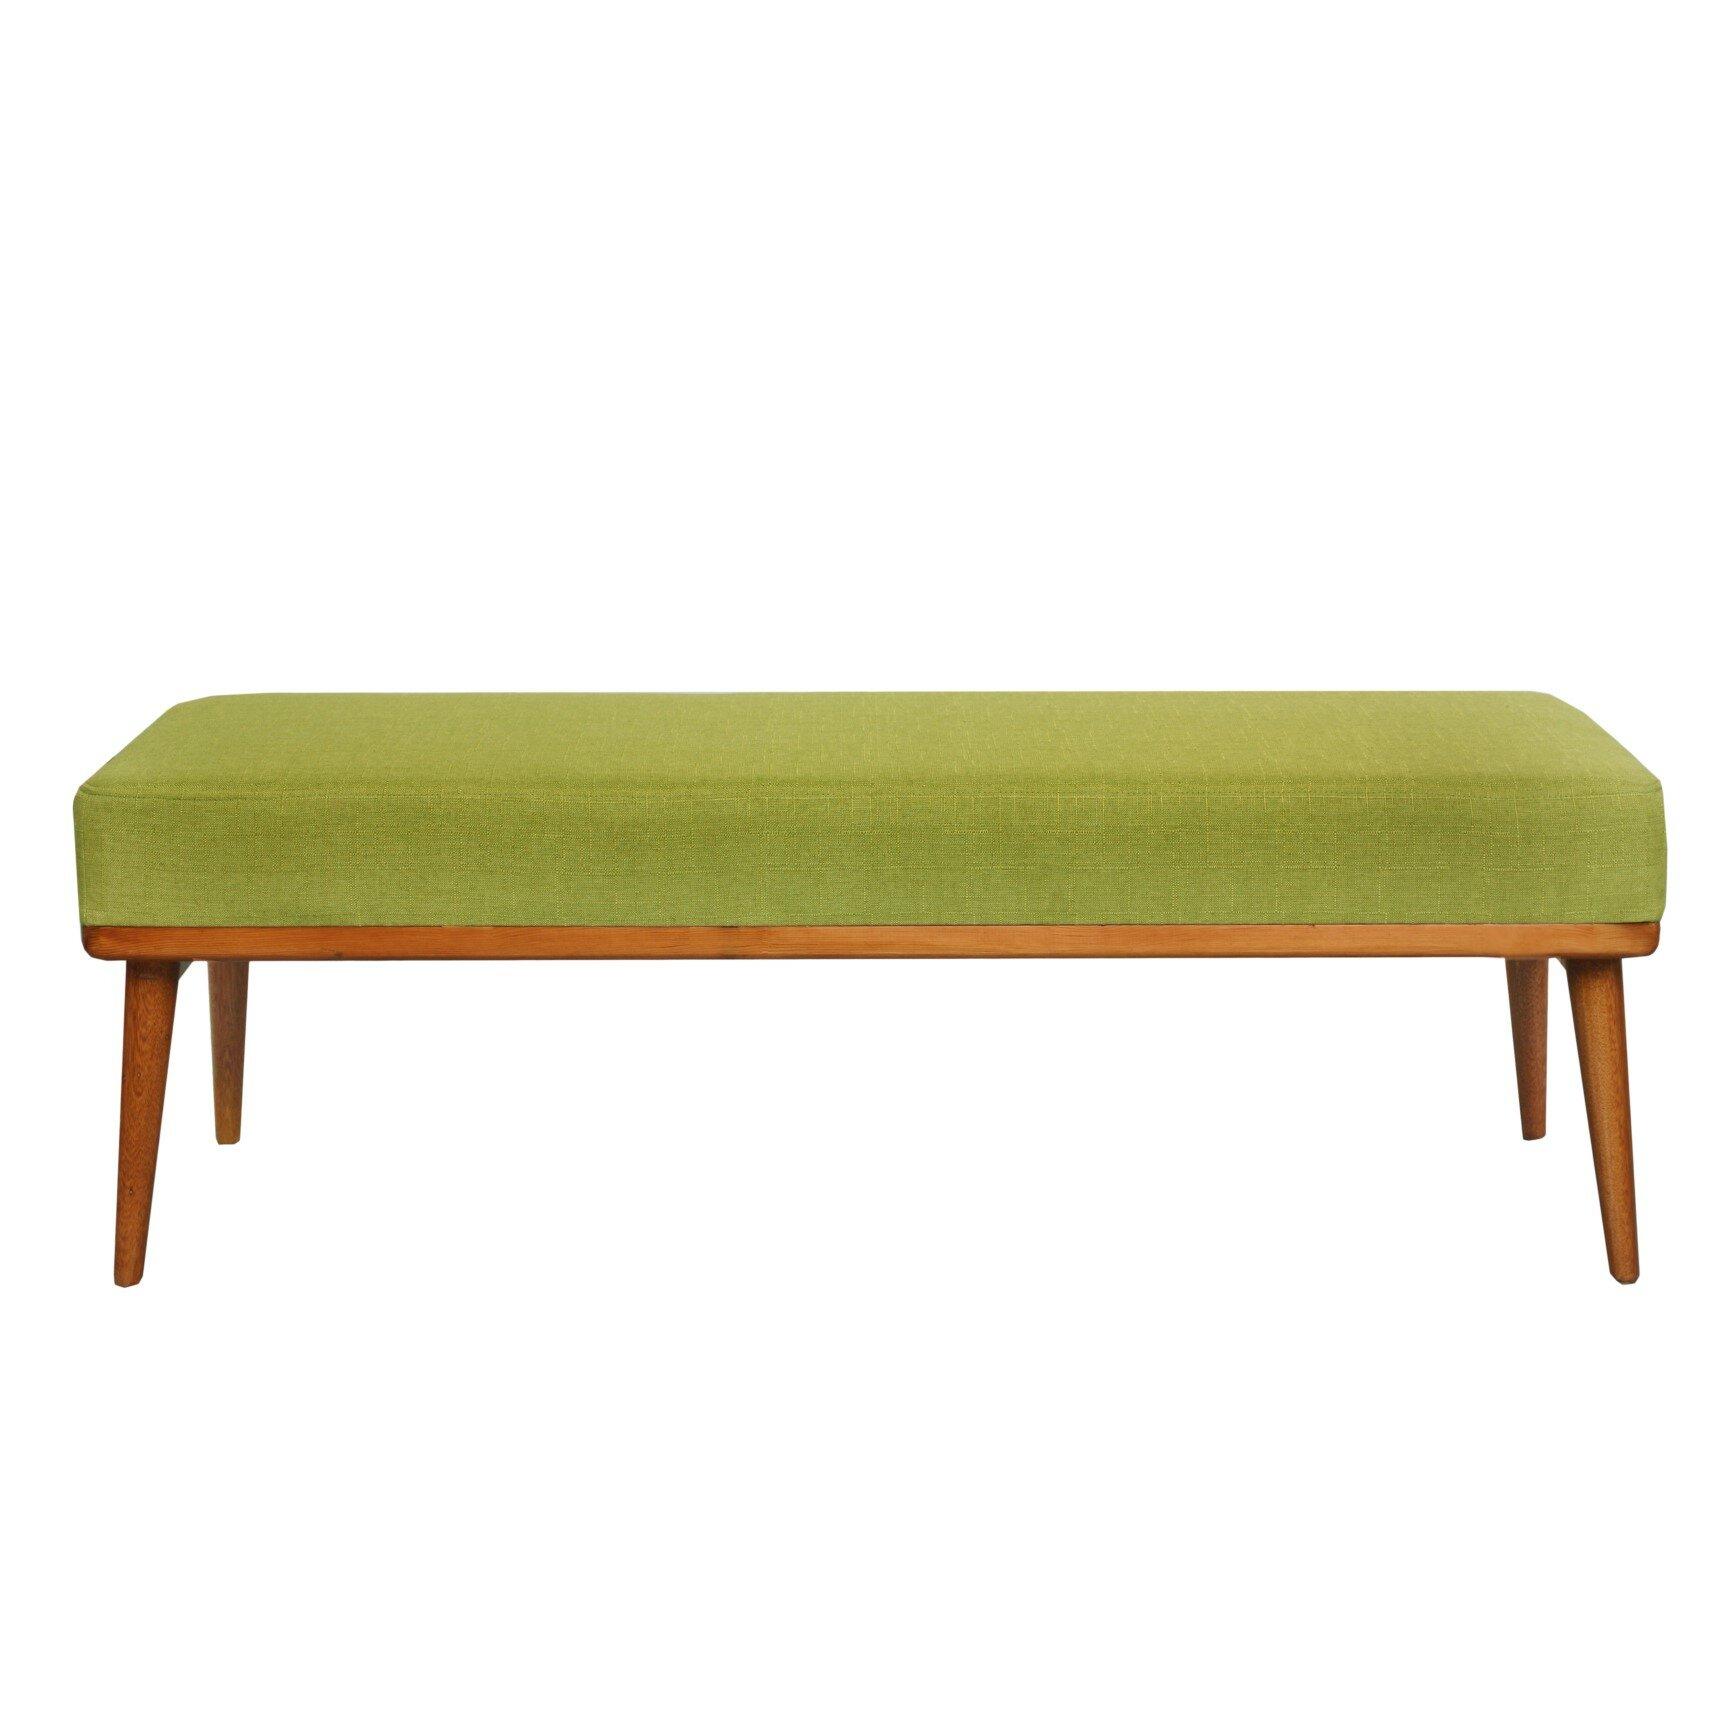 Padded Bench For Bedroom Vivienne Upholstered Bedroom Bench Reviews Allmodern